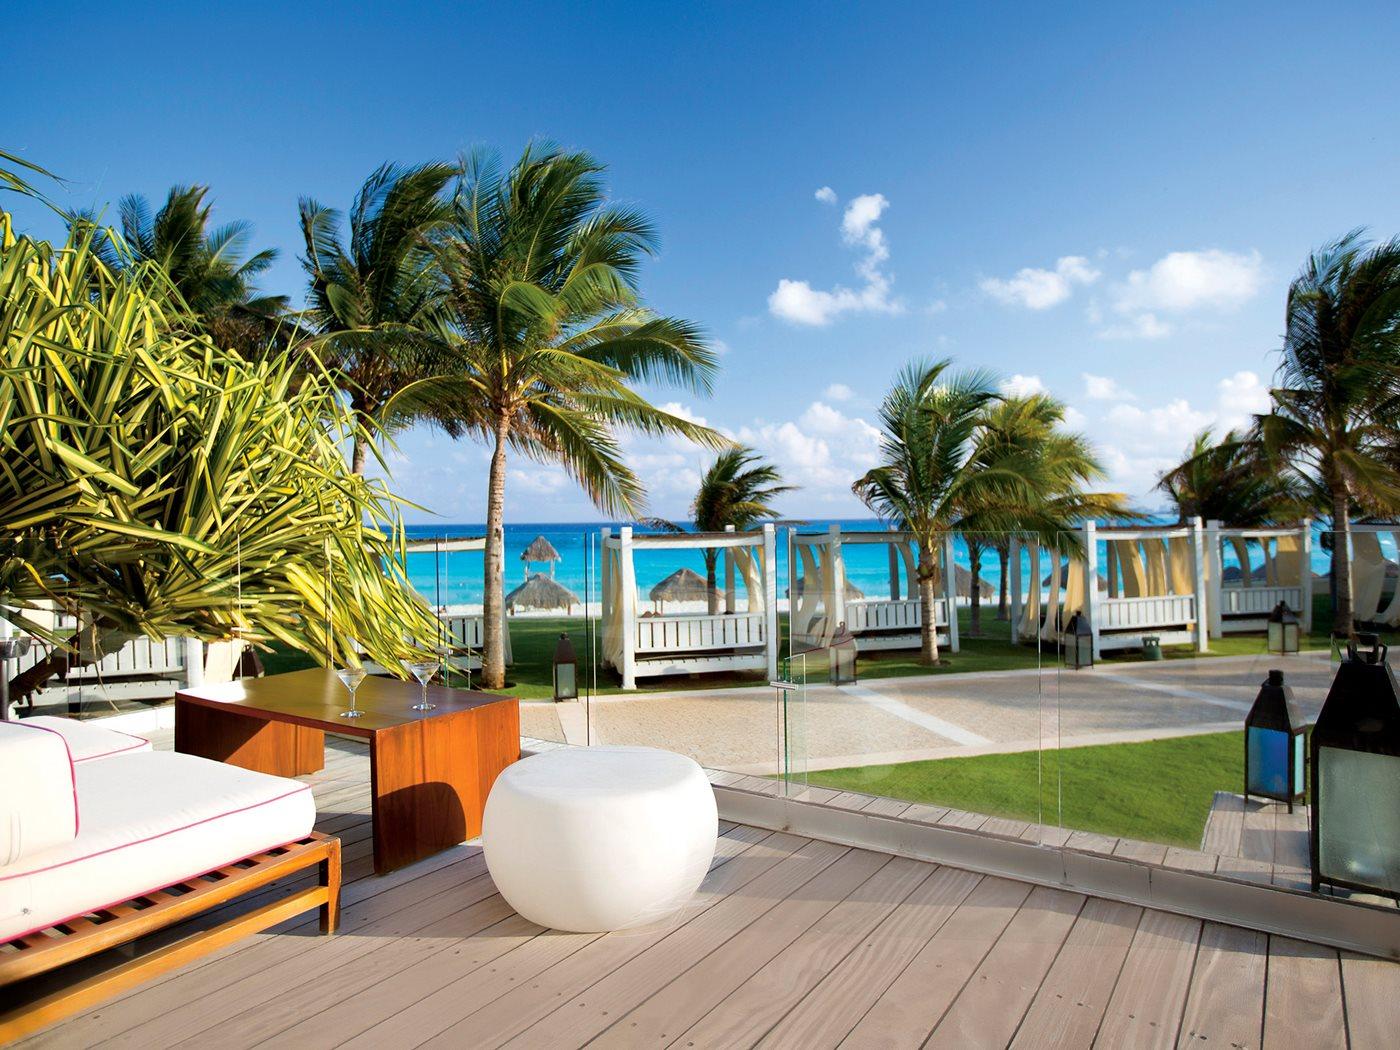 Reflect Krystal Grand Cancun Cancun Transat